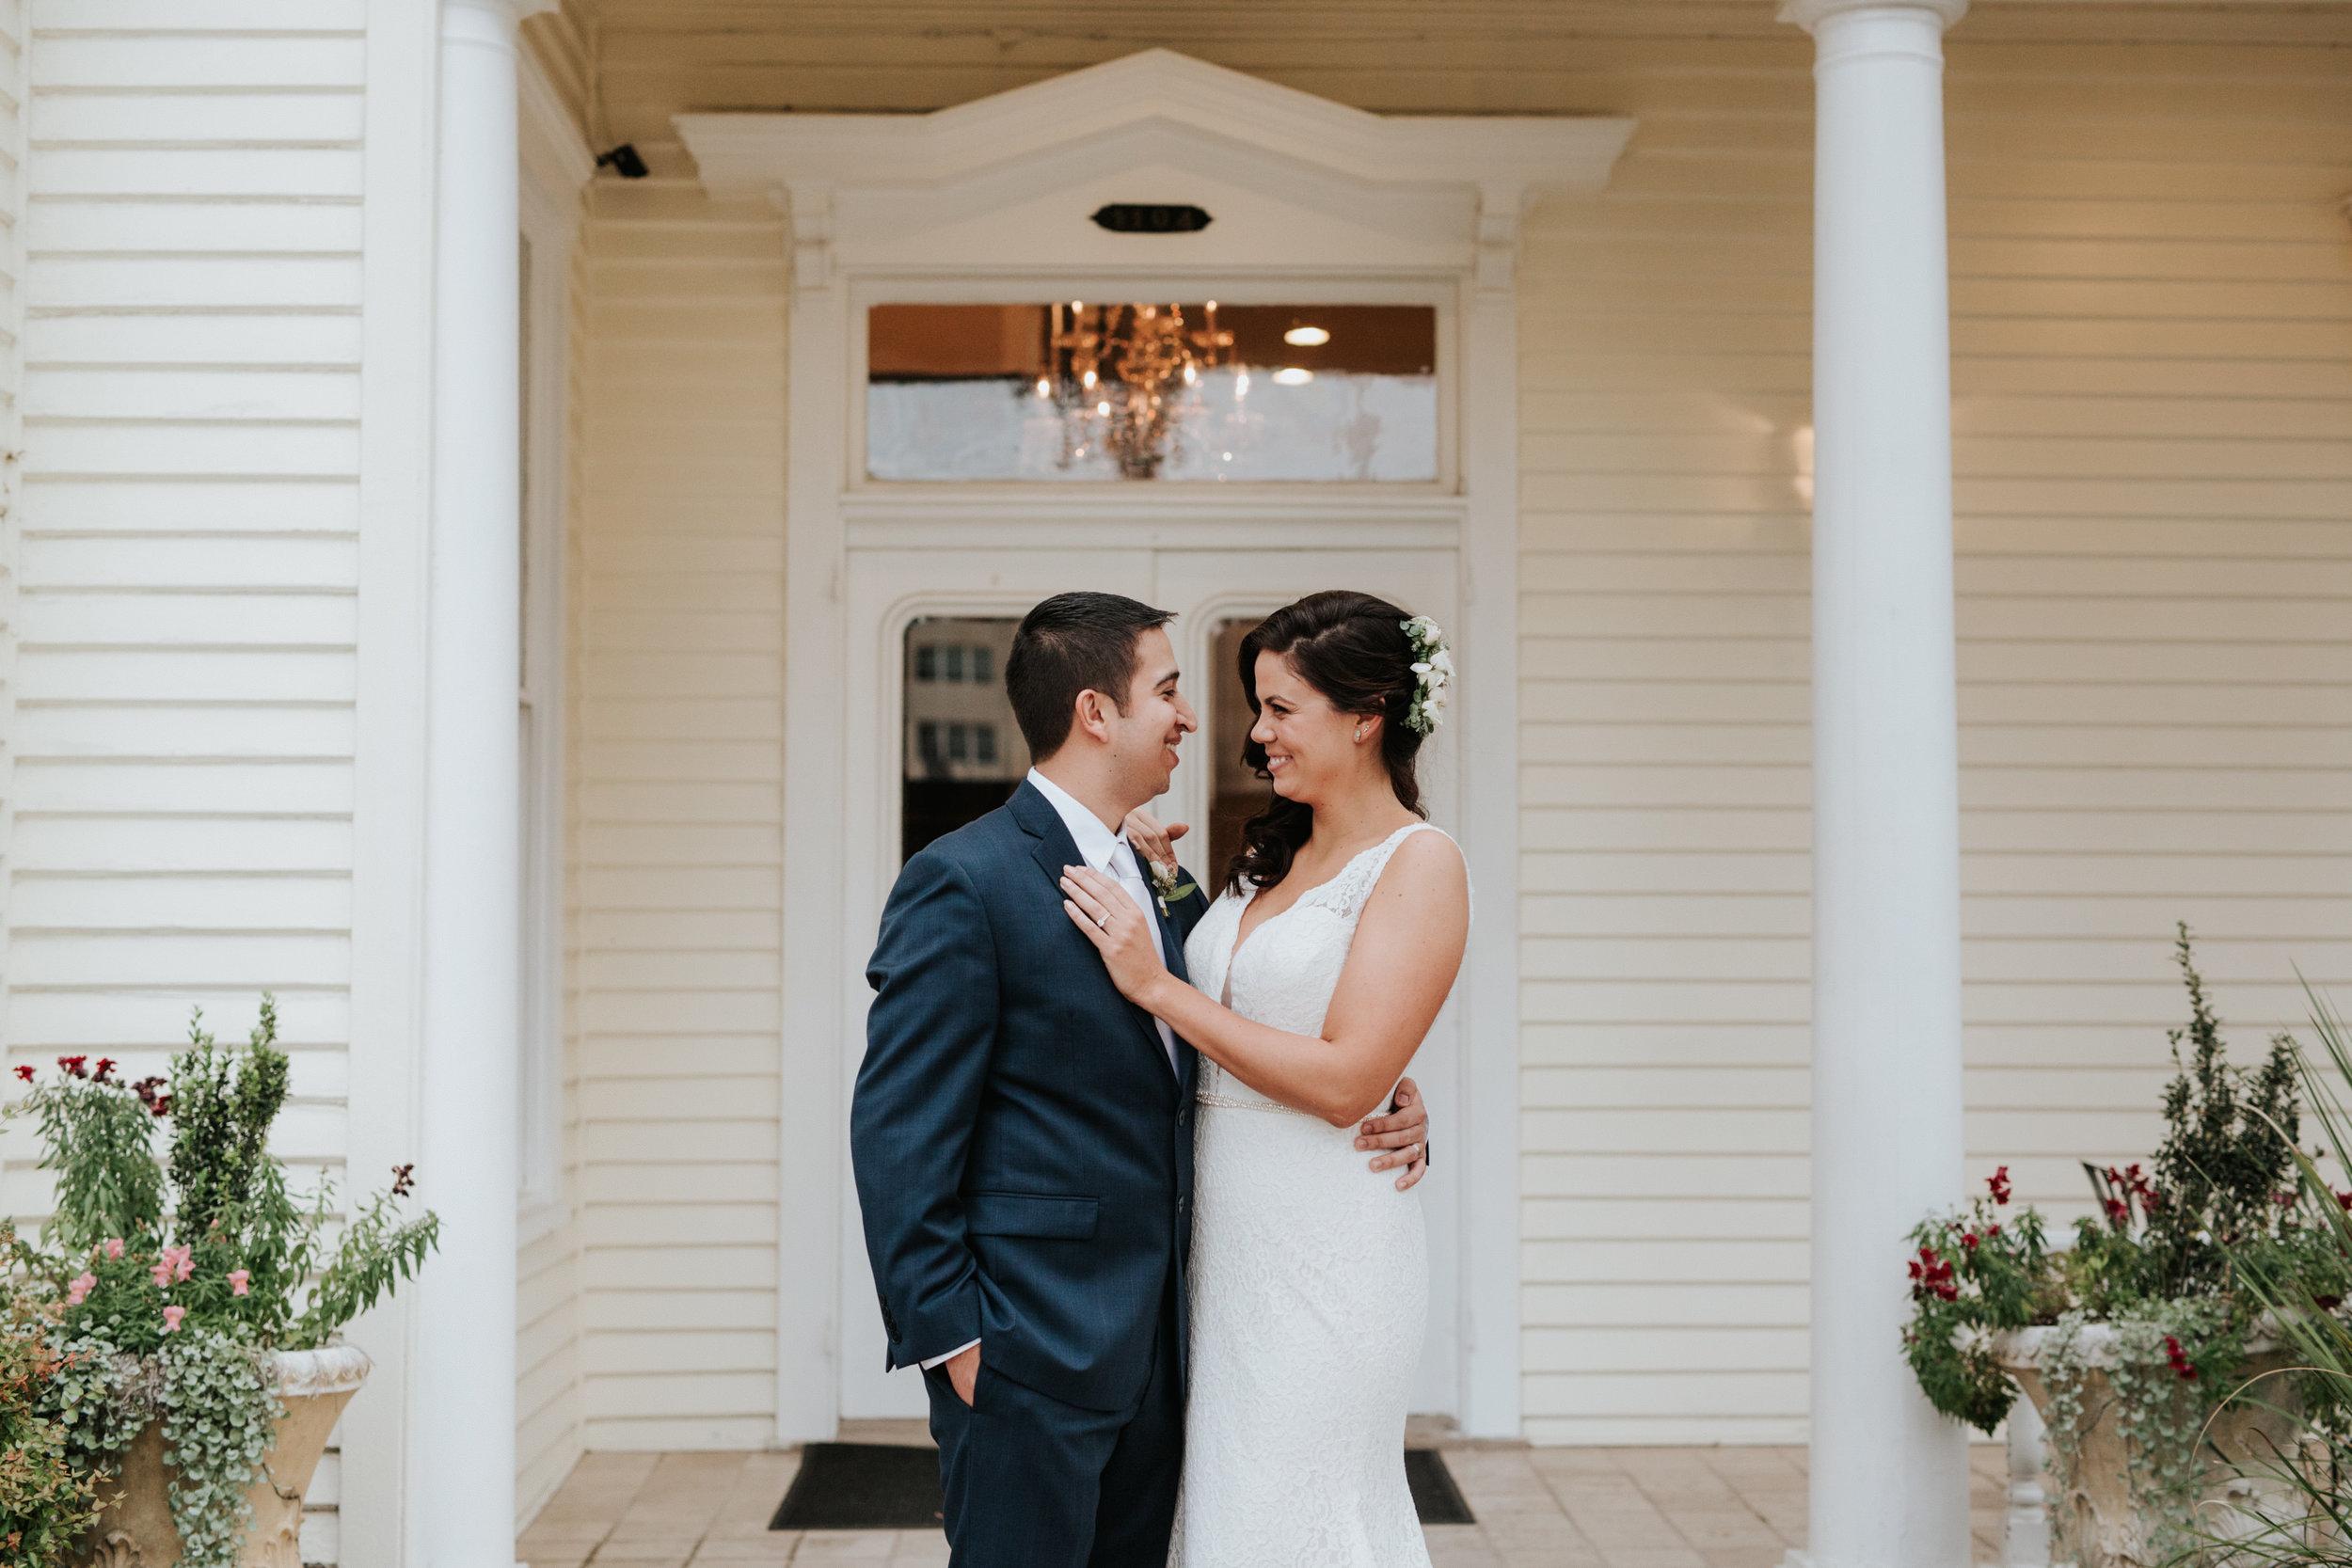 Ginny + Mando Wedding - Diana Ascarrunz Photography-930.JPG